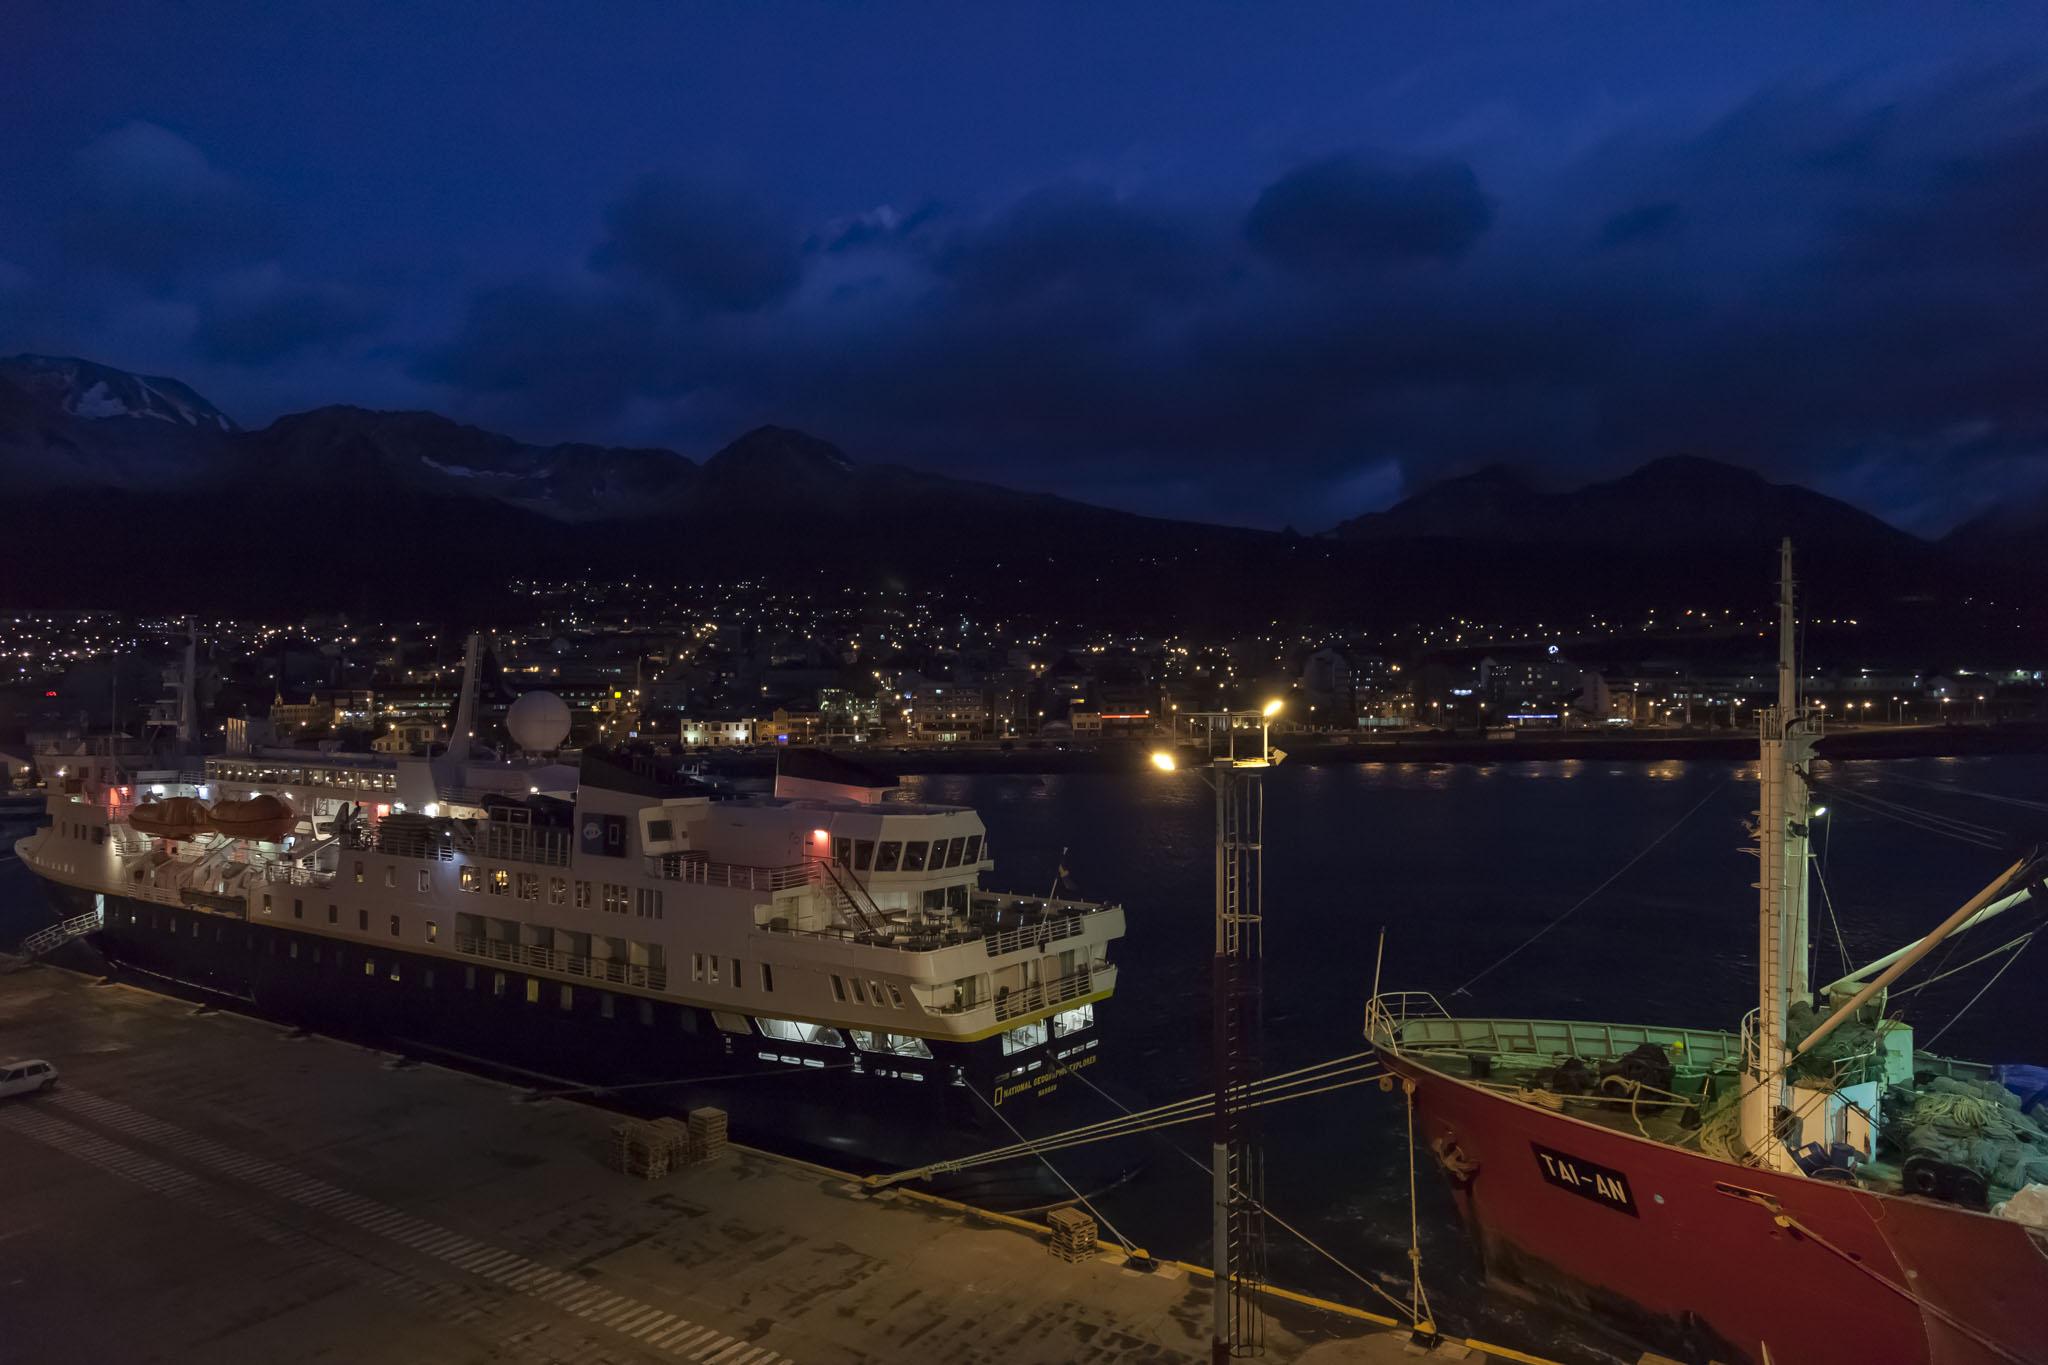 Ushuaia Port